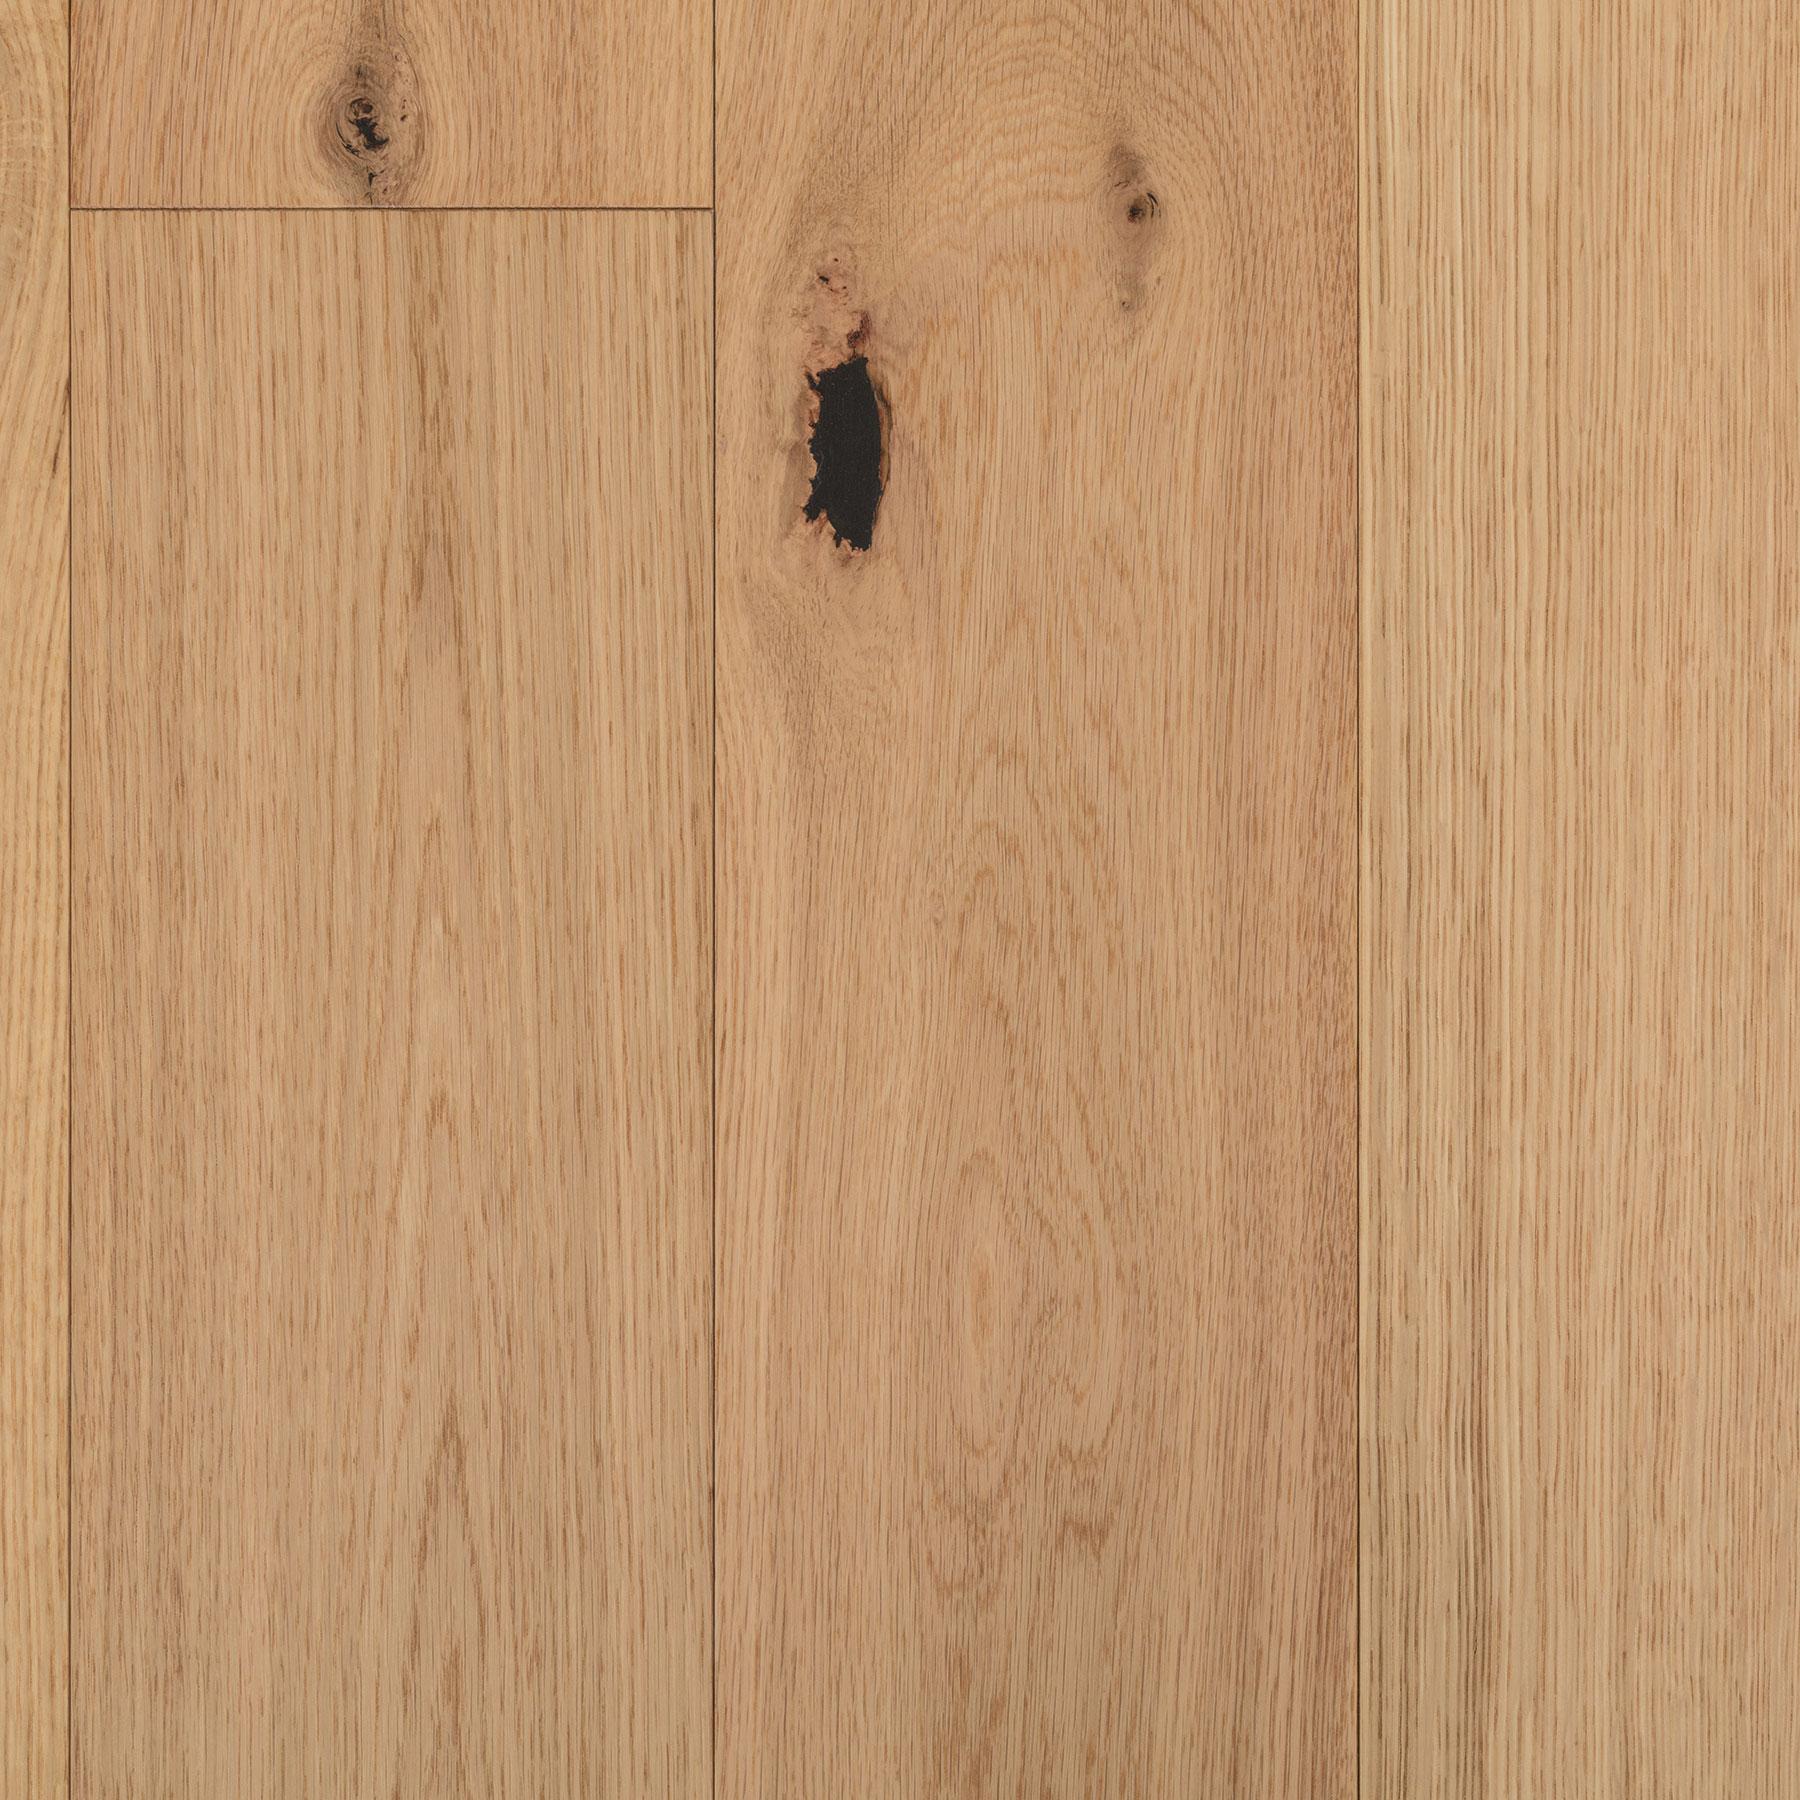 aa engineered floors product white q natural flooring rq appalachian oak signature prestige r